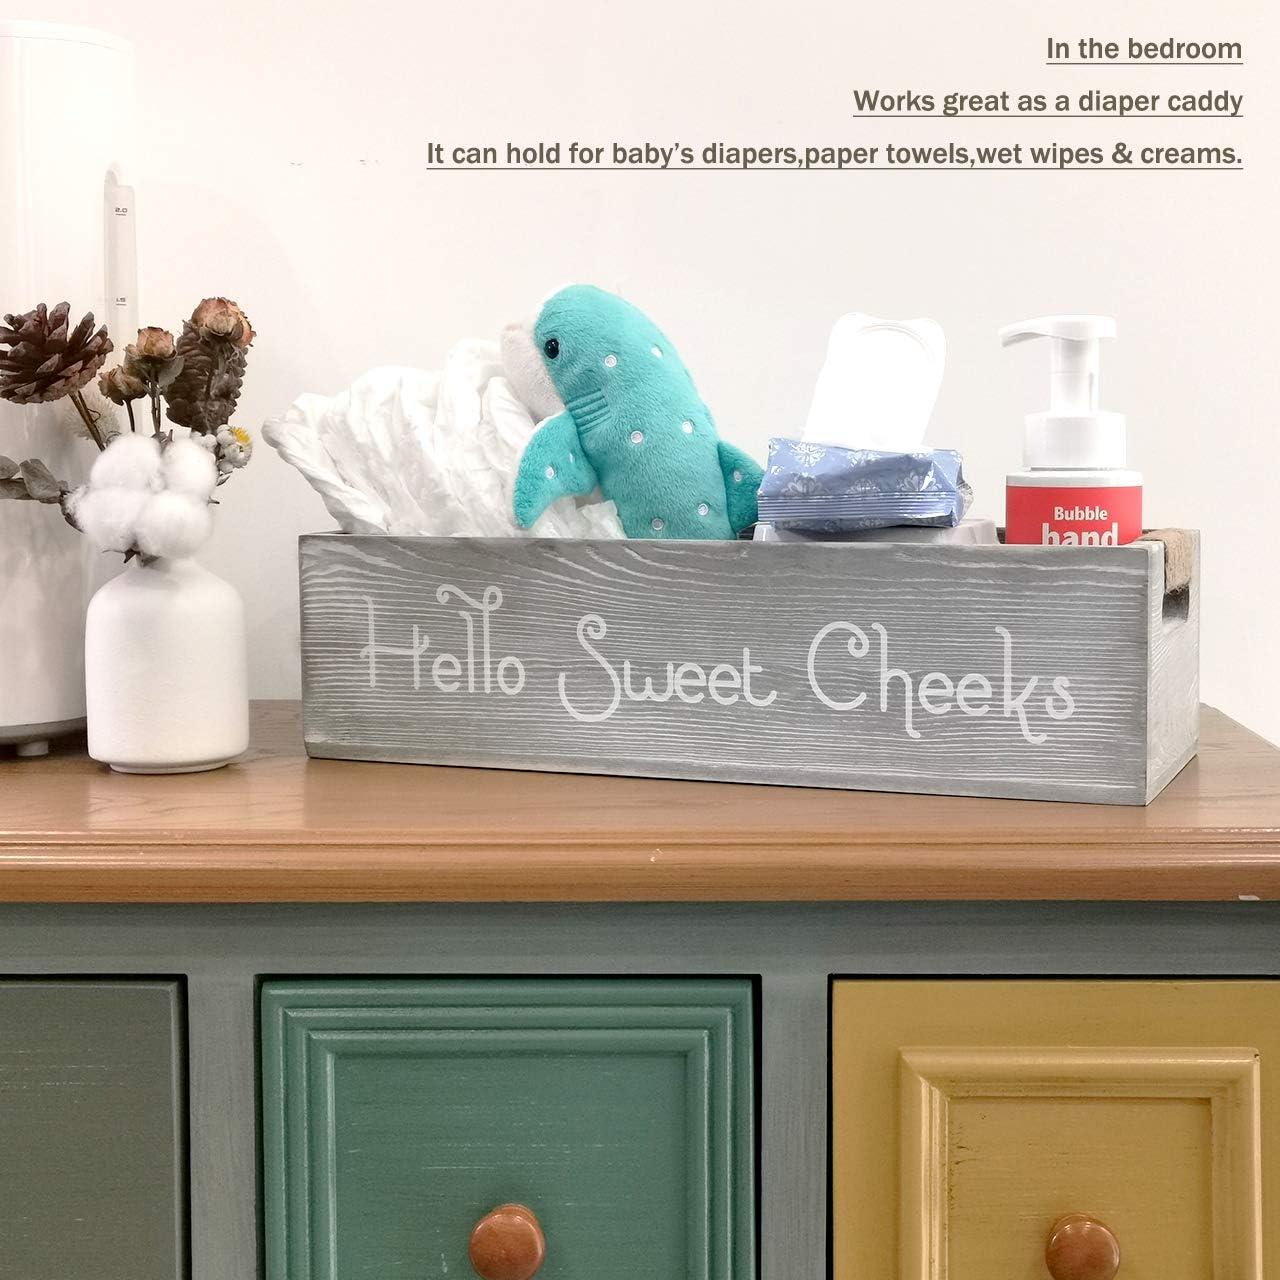 nobrand Farmhouse Rustic Wood Organizer, Bathroom Decor Box or Diaper Organizer, 2 Sides - Funny Box, Hello Sweet Cheeks with Funny Sayings (Grey): Home & Kitchen